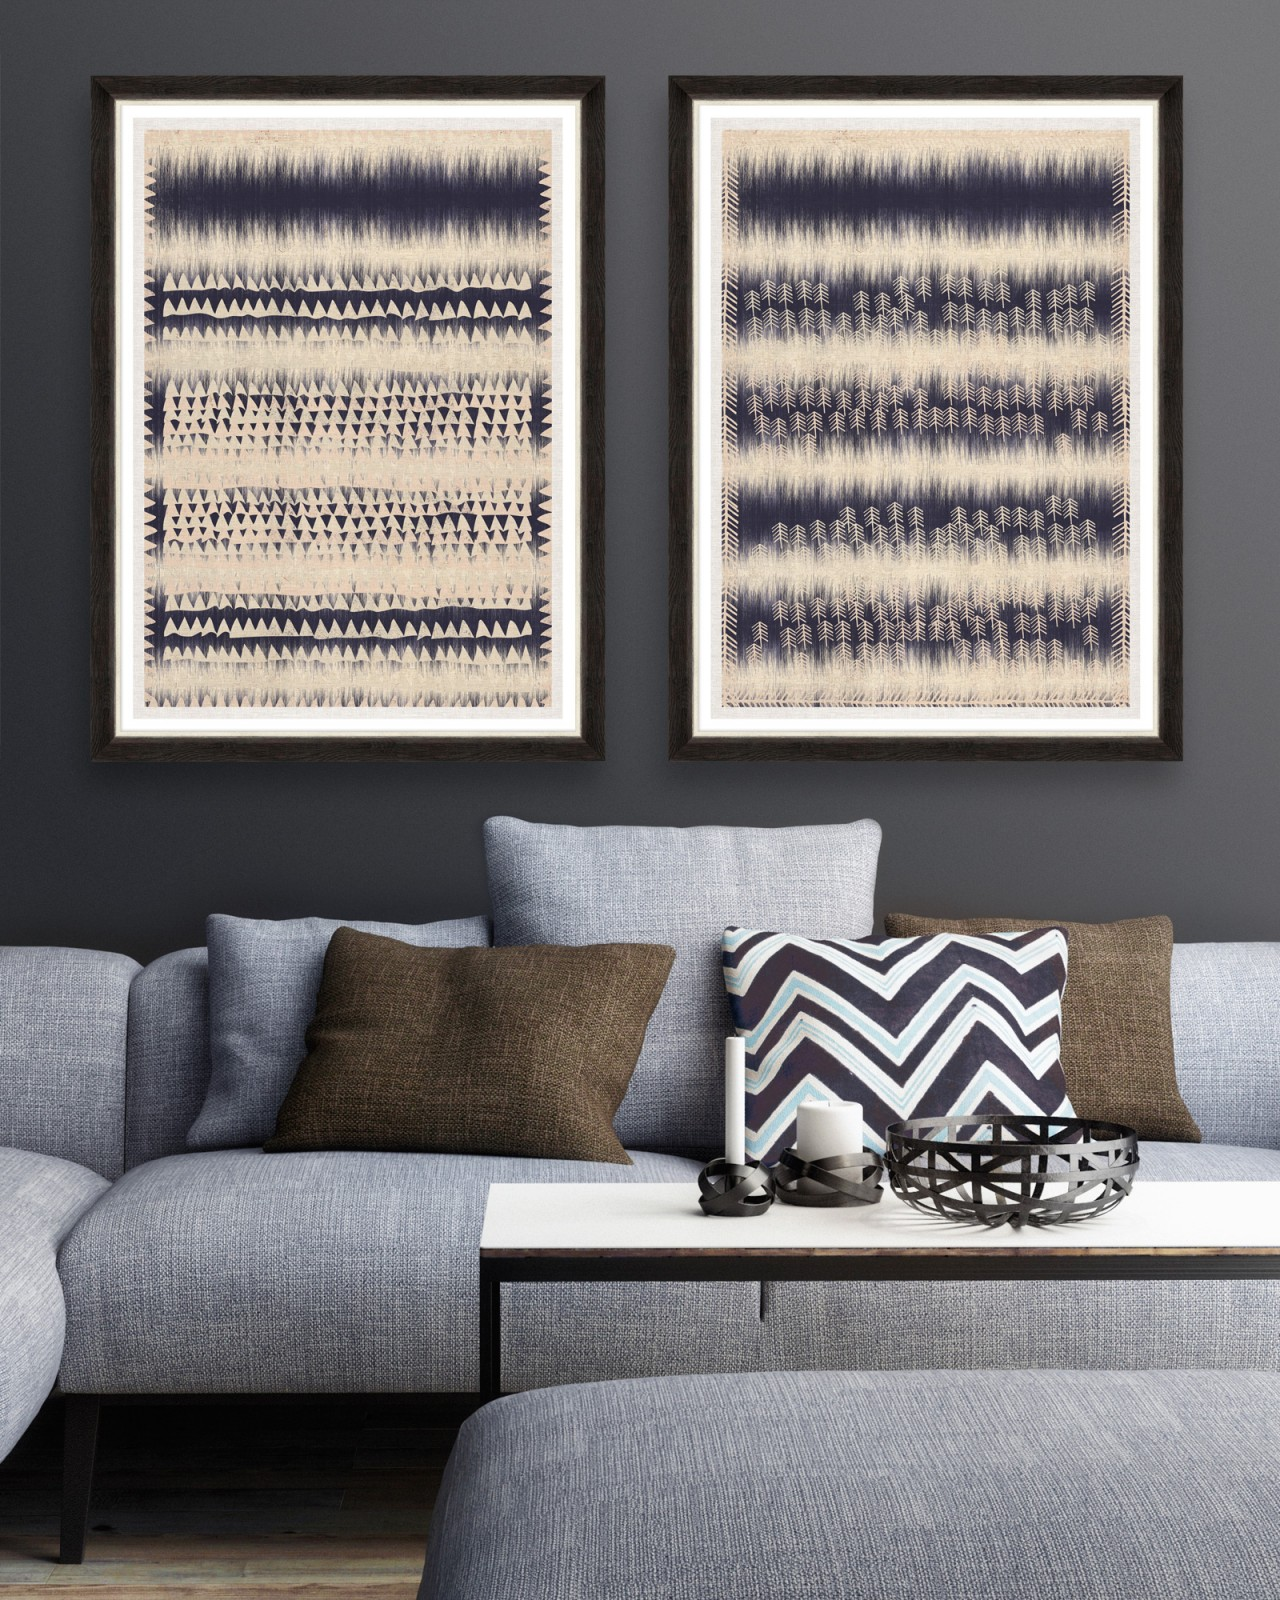 INDIGO PATTERNS Set of 2 Framed art